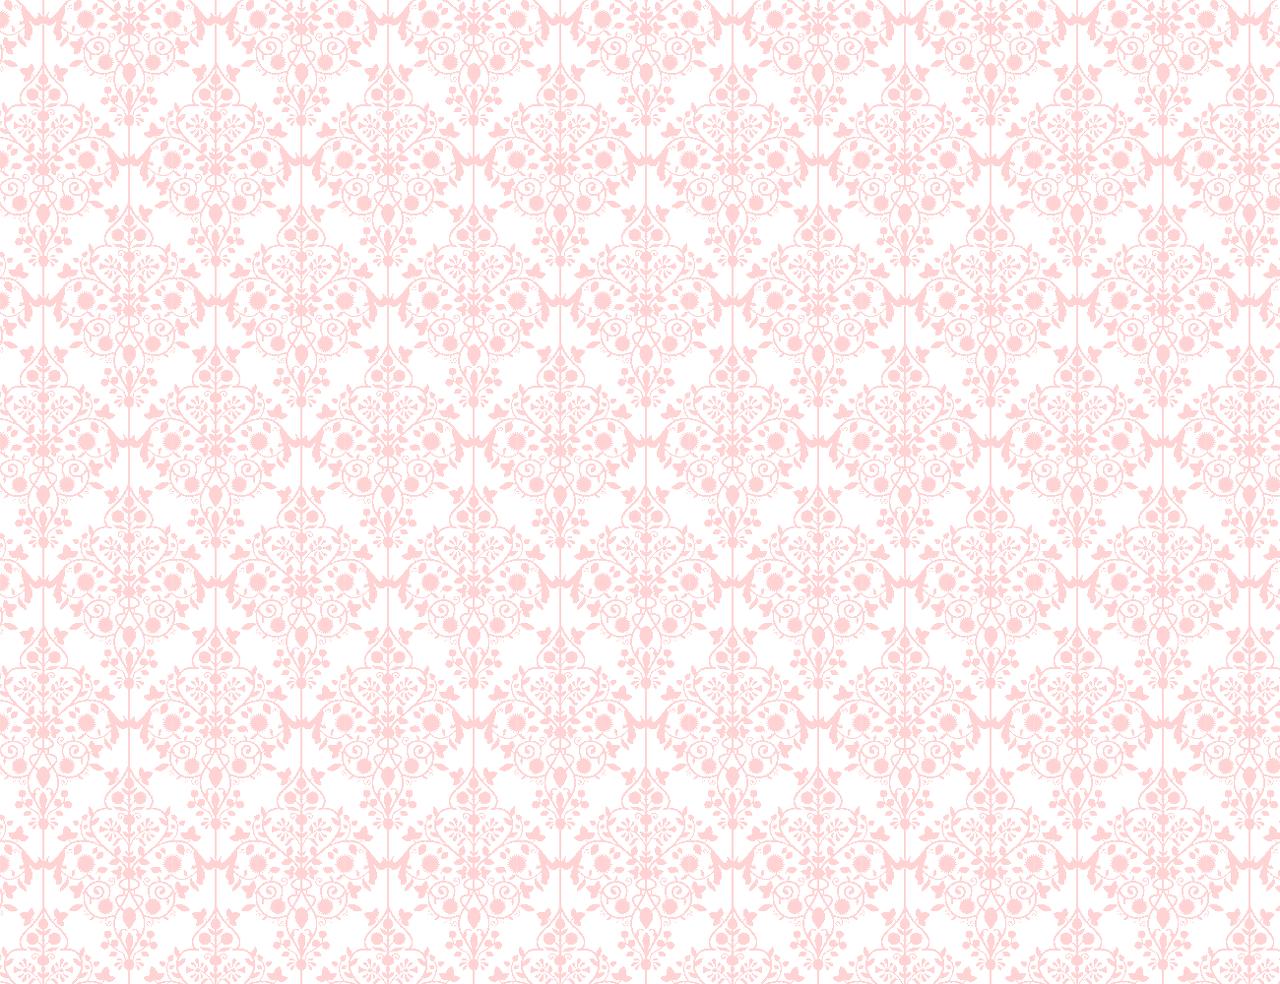 Pink Dahlia Floral Event Design Parsippany Nj